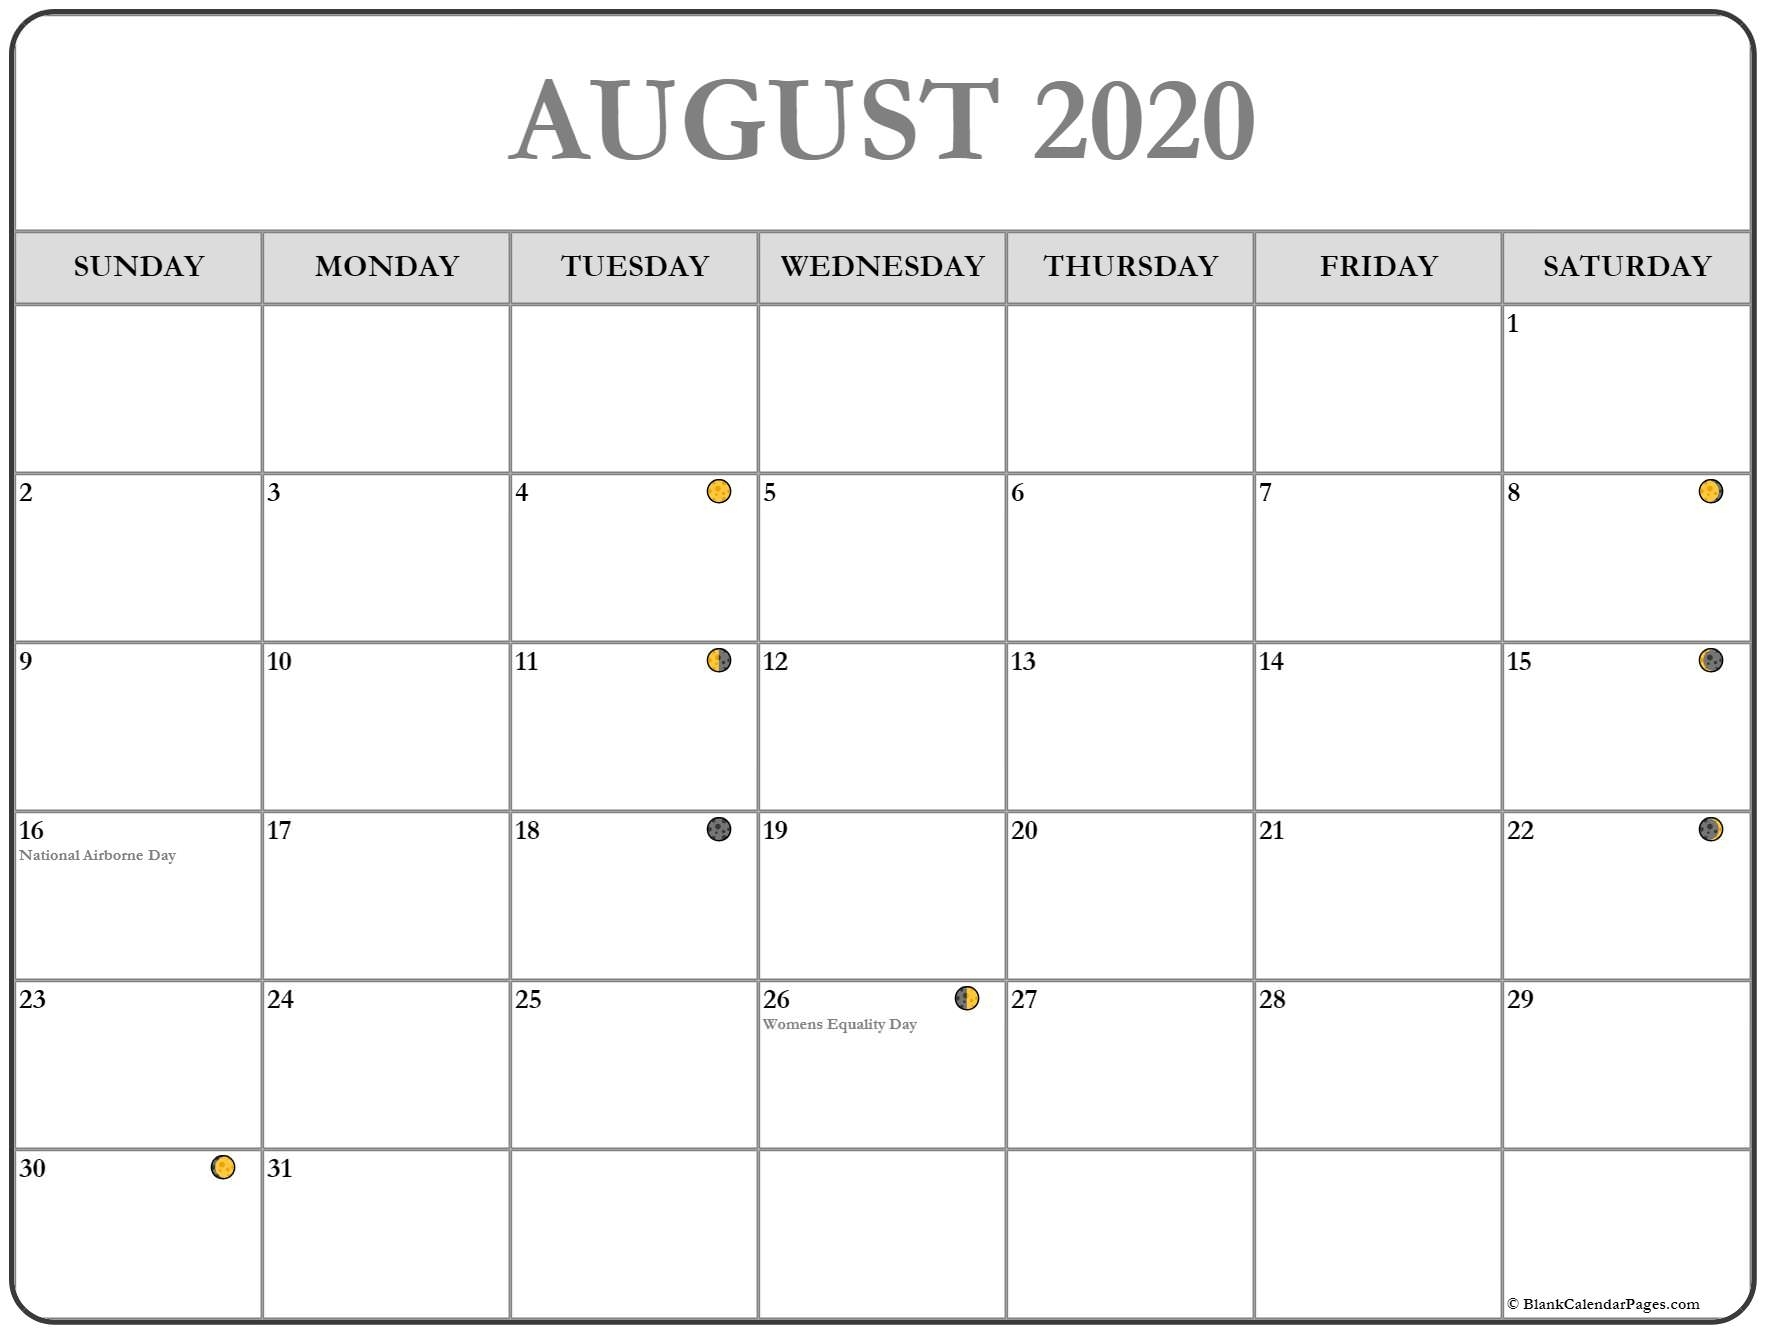 August 2020 Lunar Calendar | Moon Phase Calendar